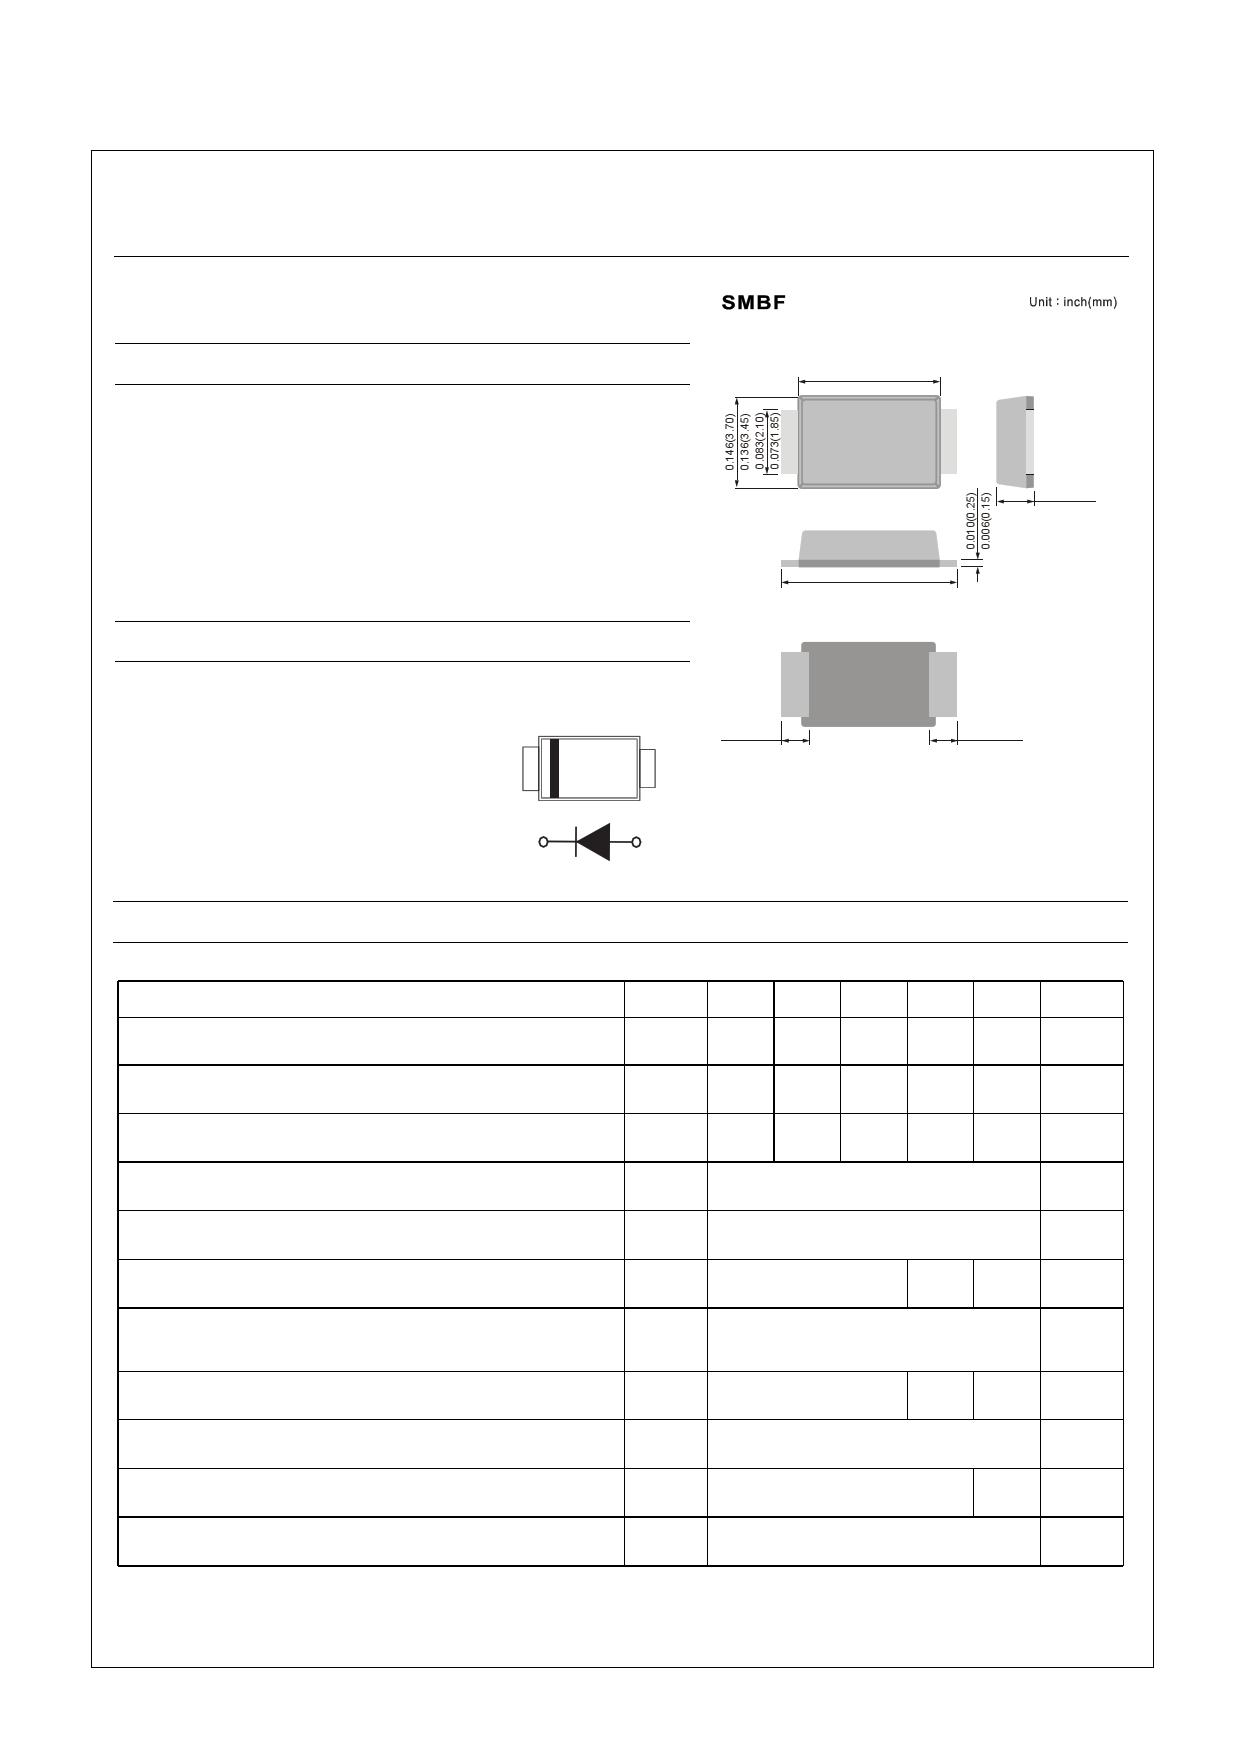 UF2DF 데이터시트 및 UF2DF PDF